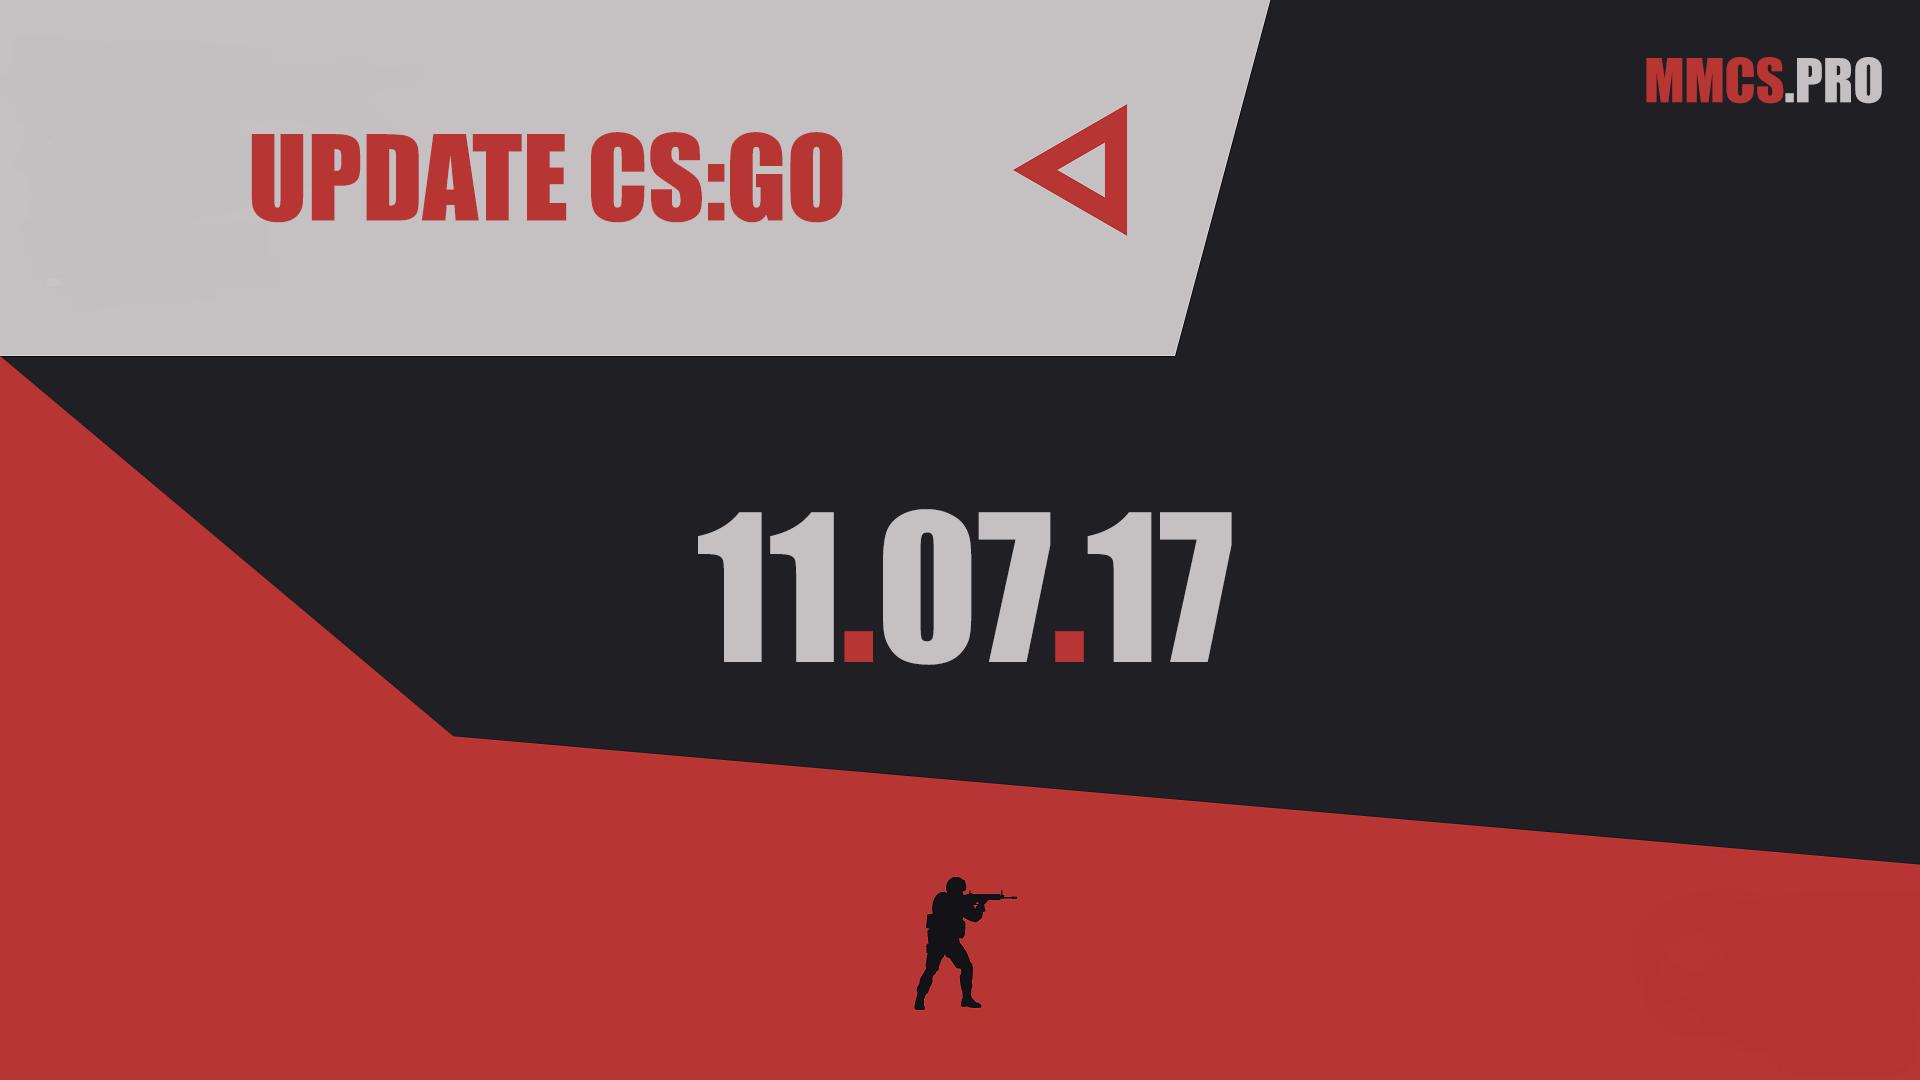 https://mmcs.pro/update-csgo-11-07-2017-valve/